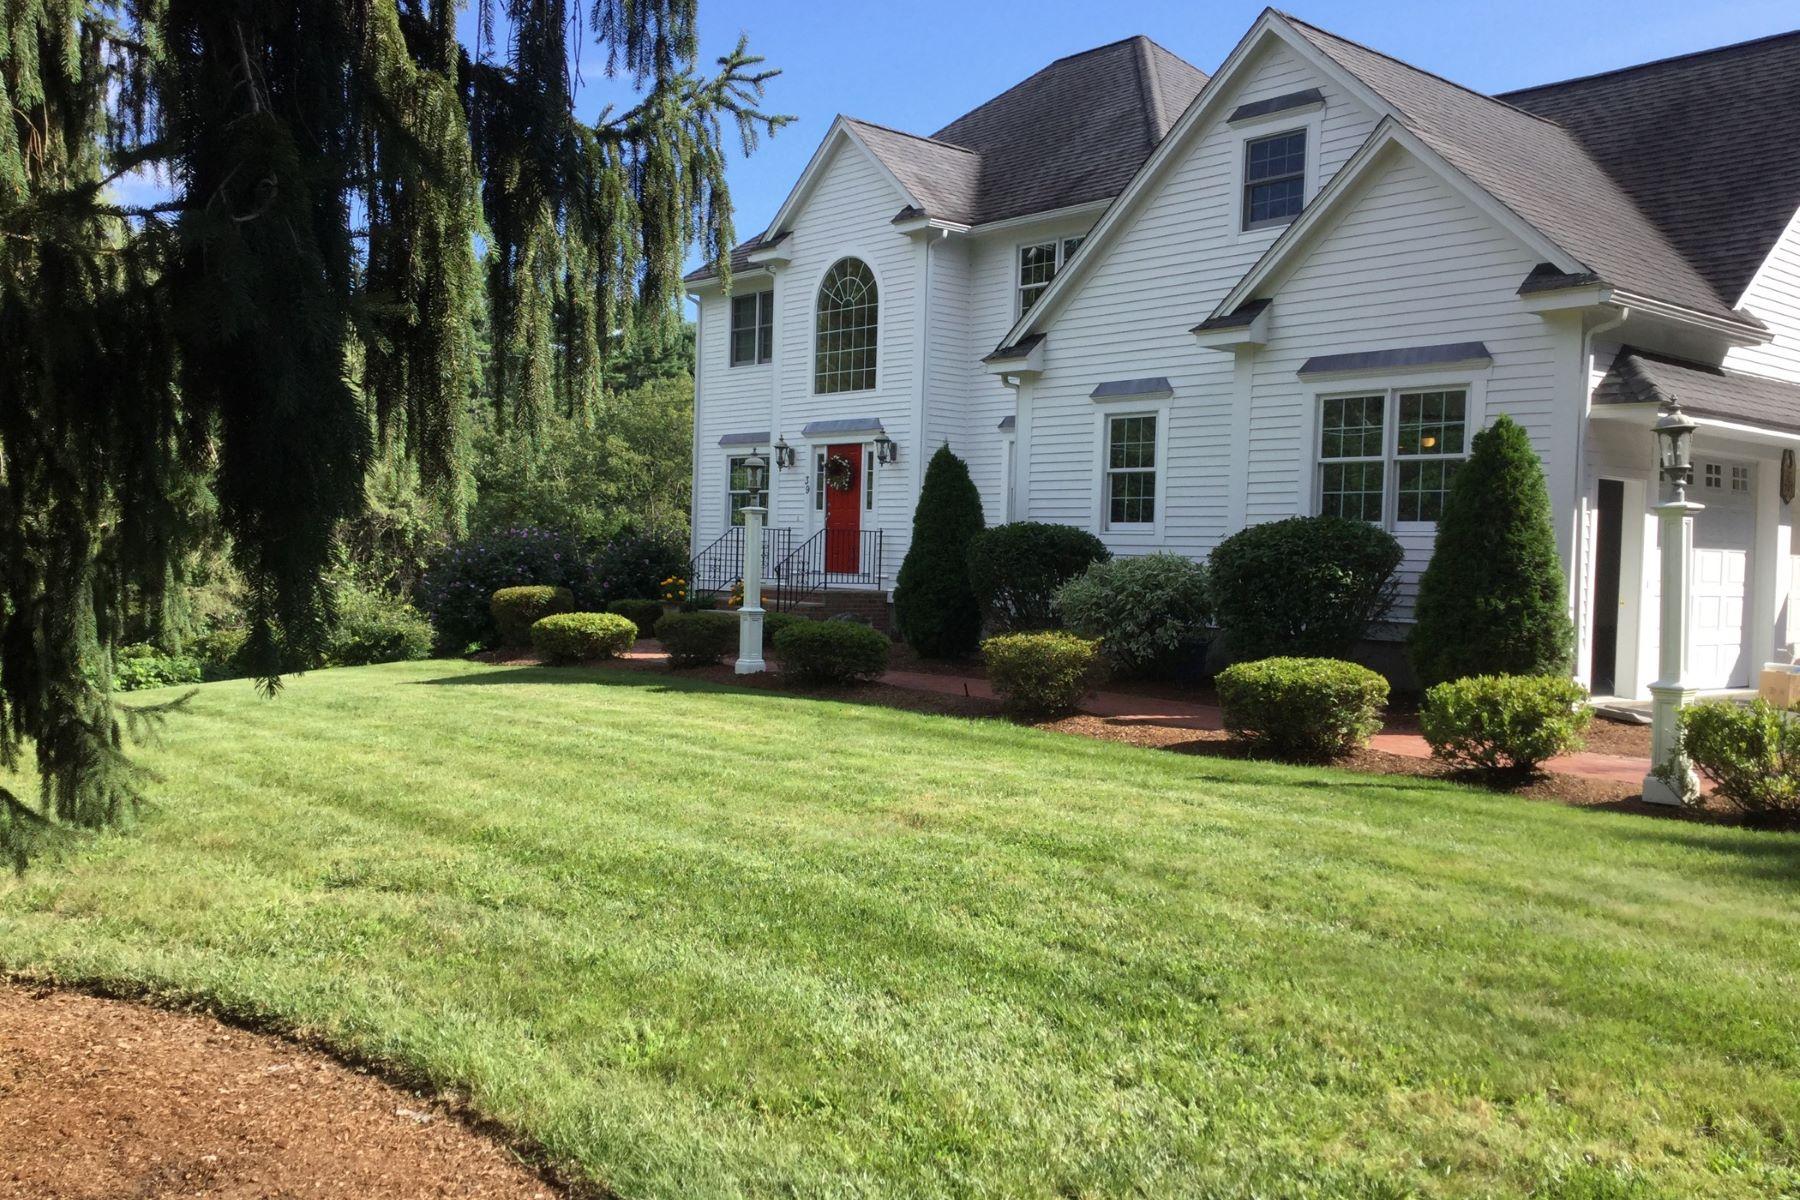 Villa per Vendita alle ore 39 Forest Park Drive, Carlisle Carlisle, Massachusetts, 01741 Stati Uniti